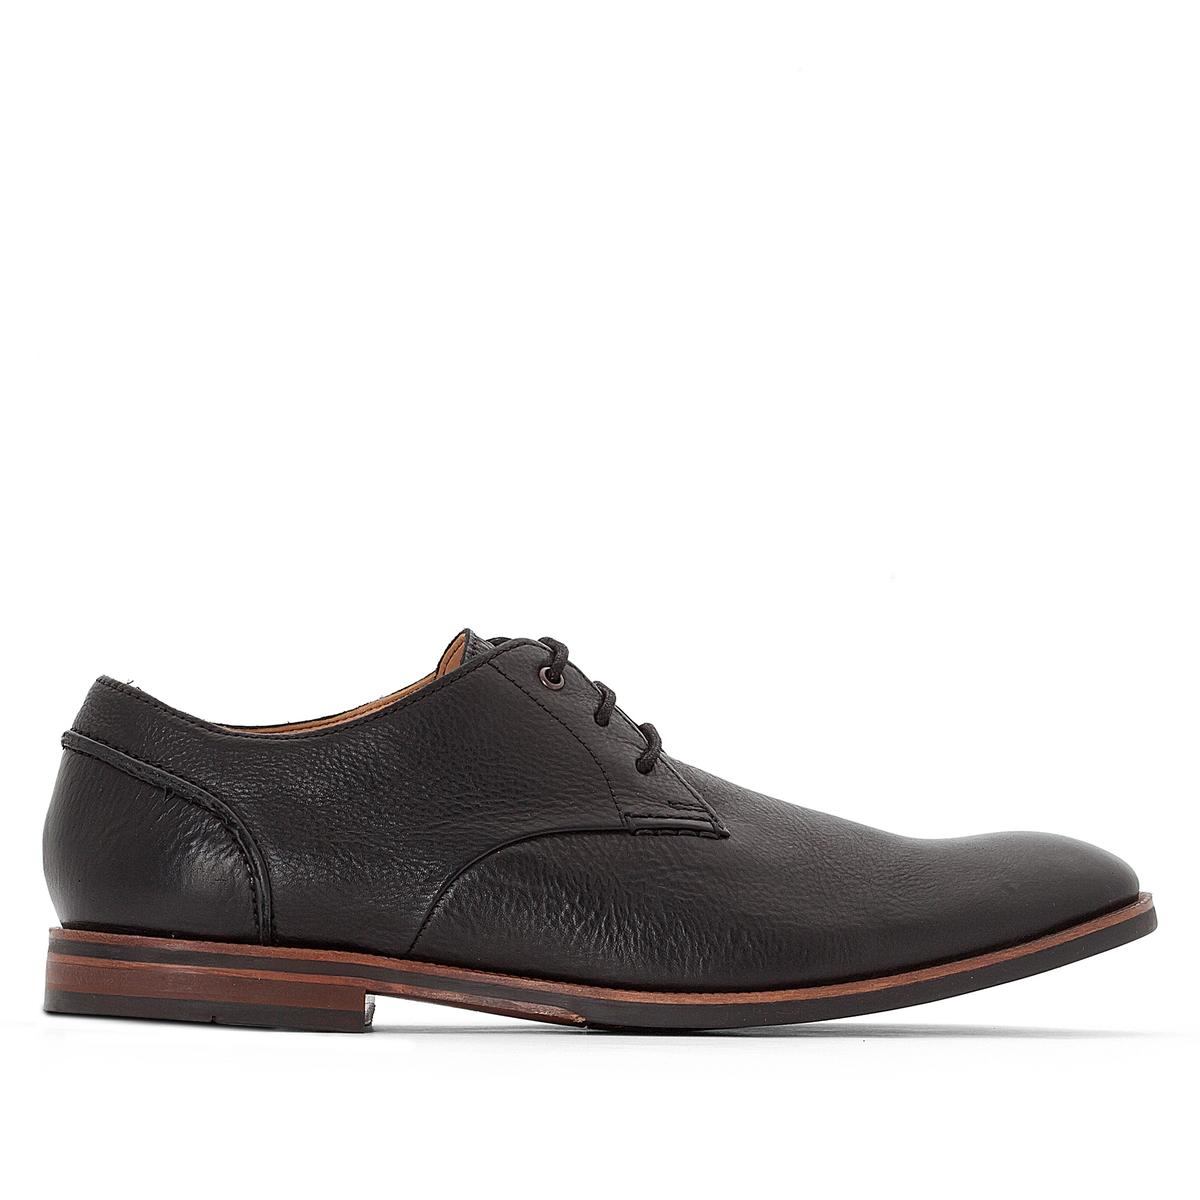 Ботинки-оксфорды кожаные Broyd Walk